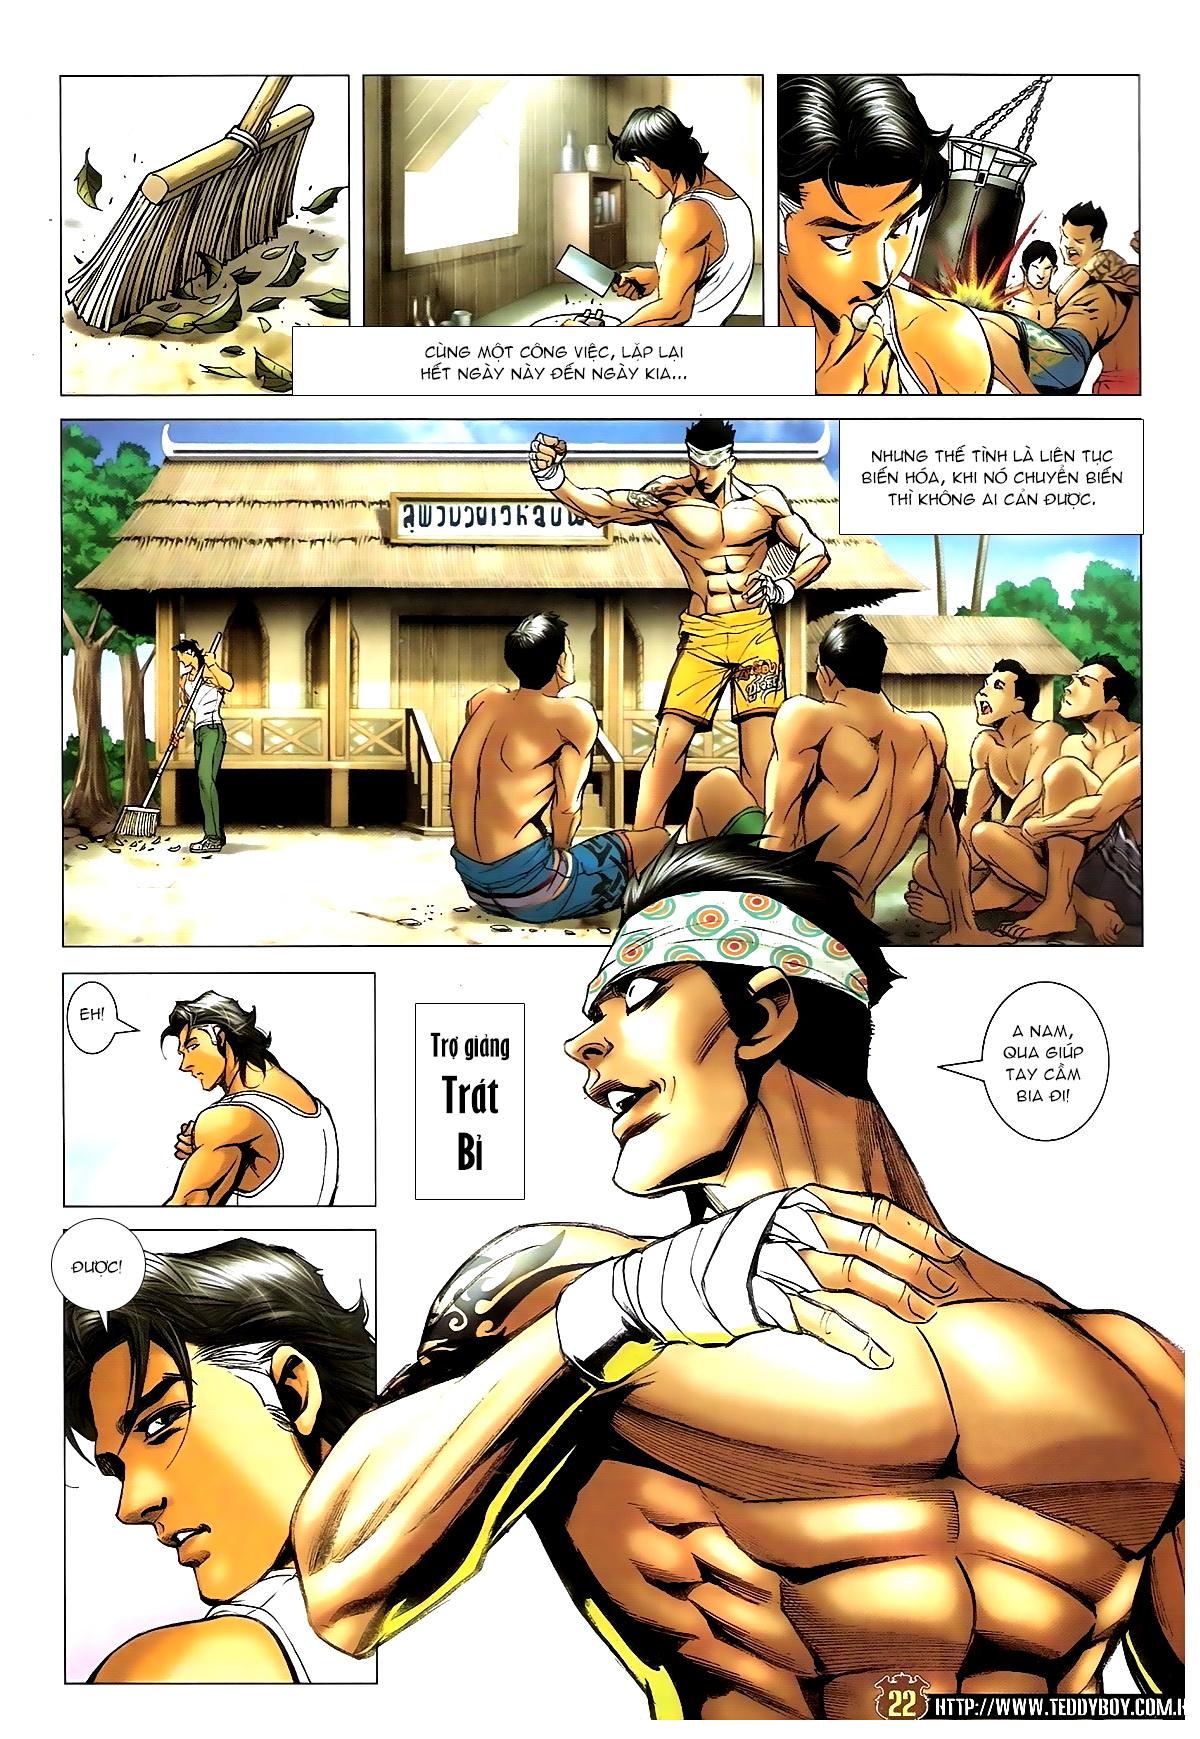 Người Trong Giang Hồ Chap 1391 - Truyen.Chap.VN